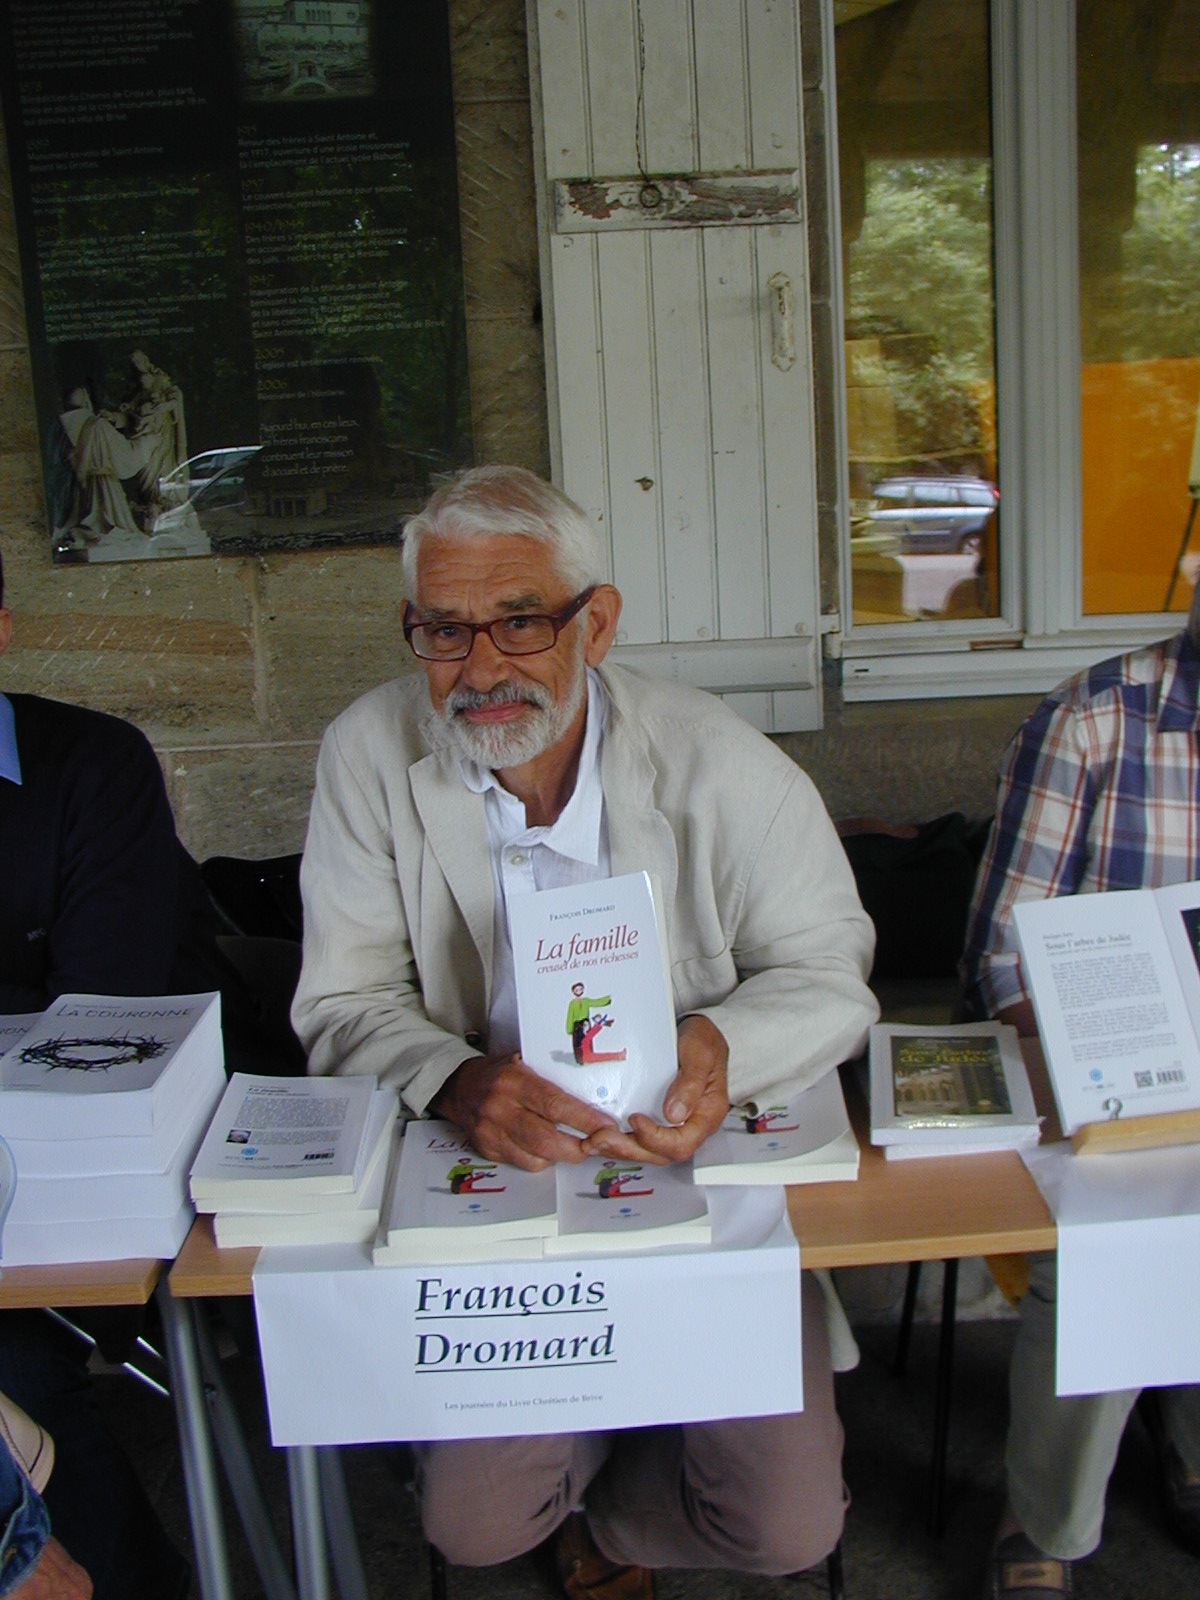 François Dromard